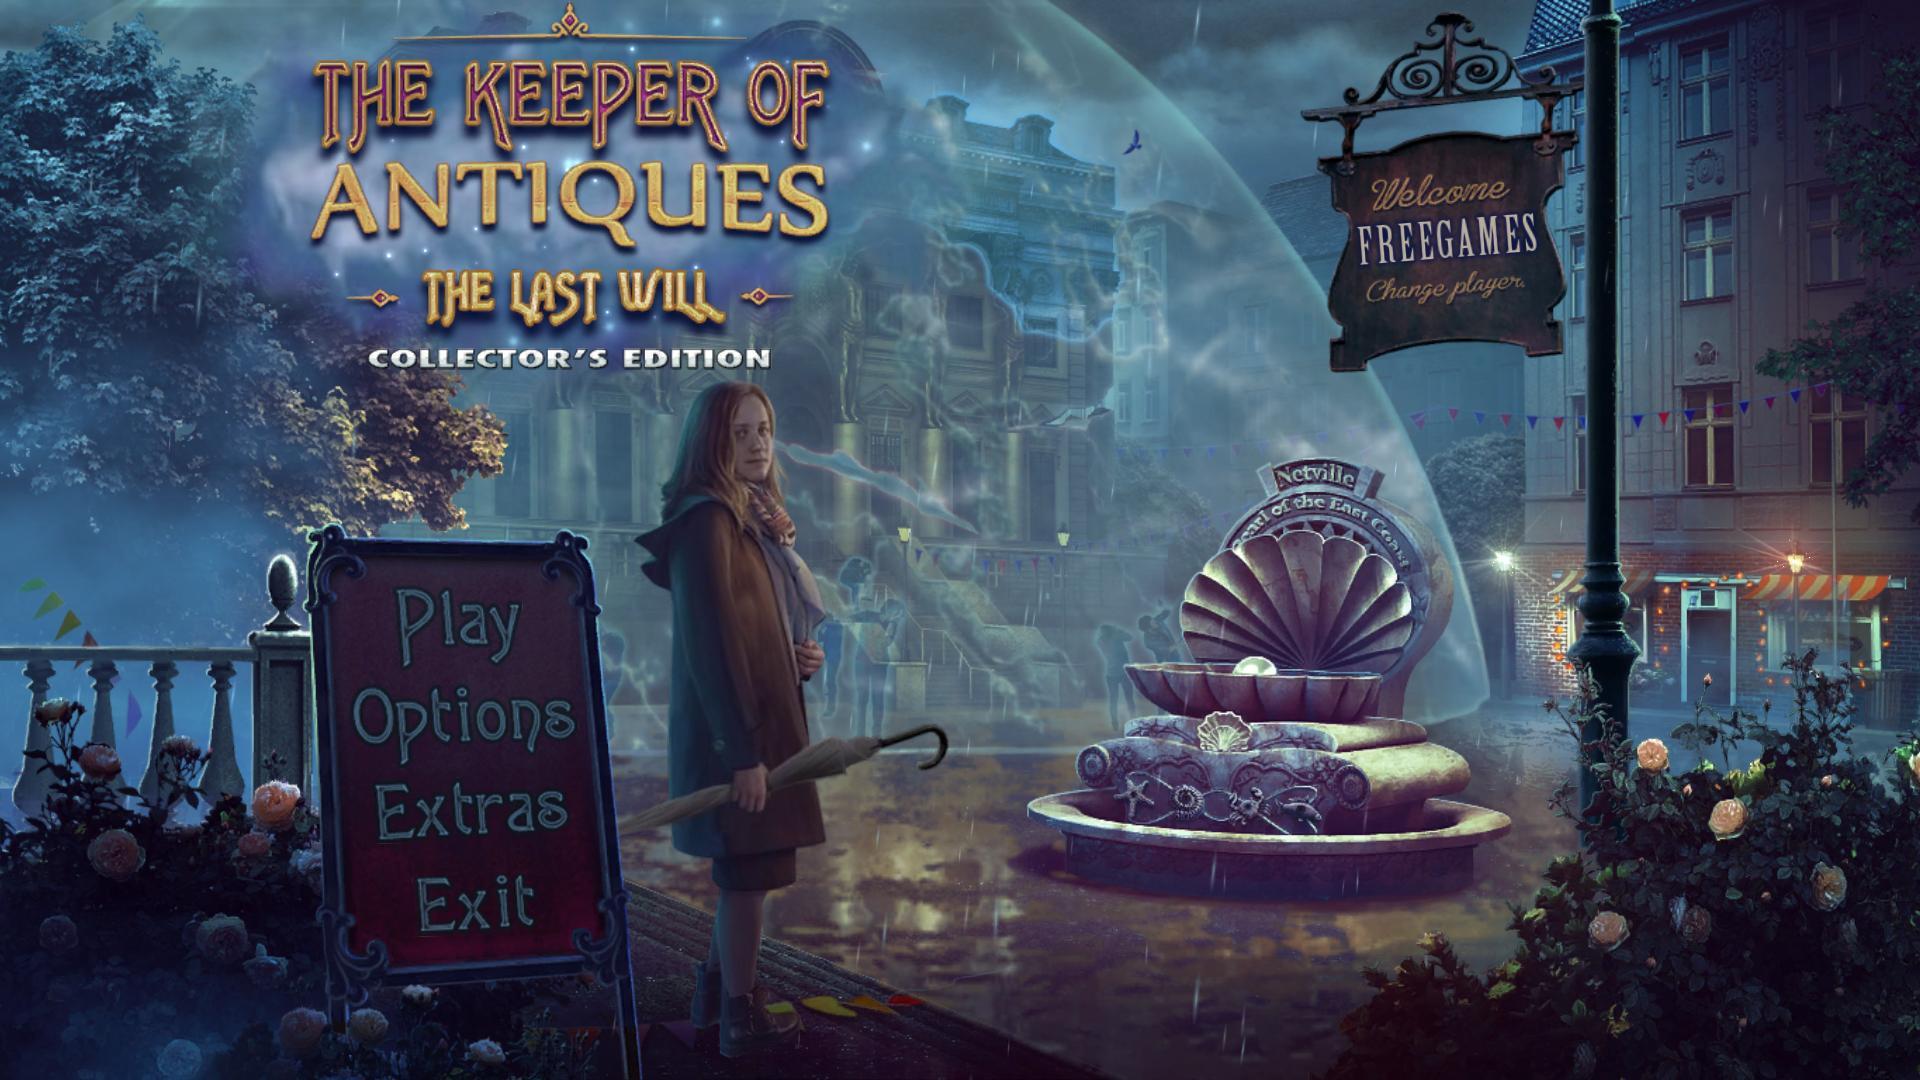 Антиквар 3: Последняя воля. Коллекционное издание | The Keeper of Antiques 3: The Last Will CE (Rus)